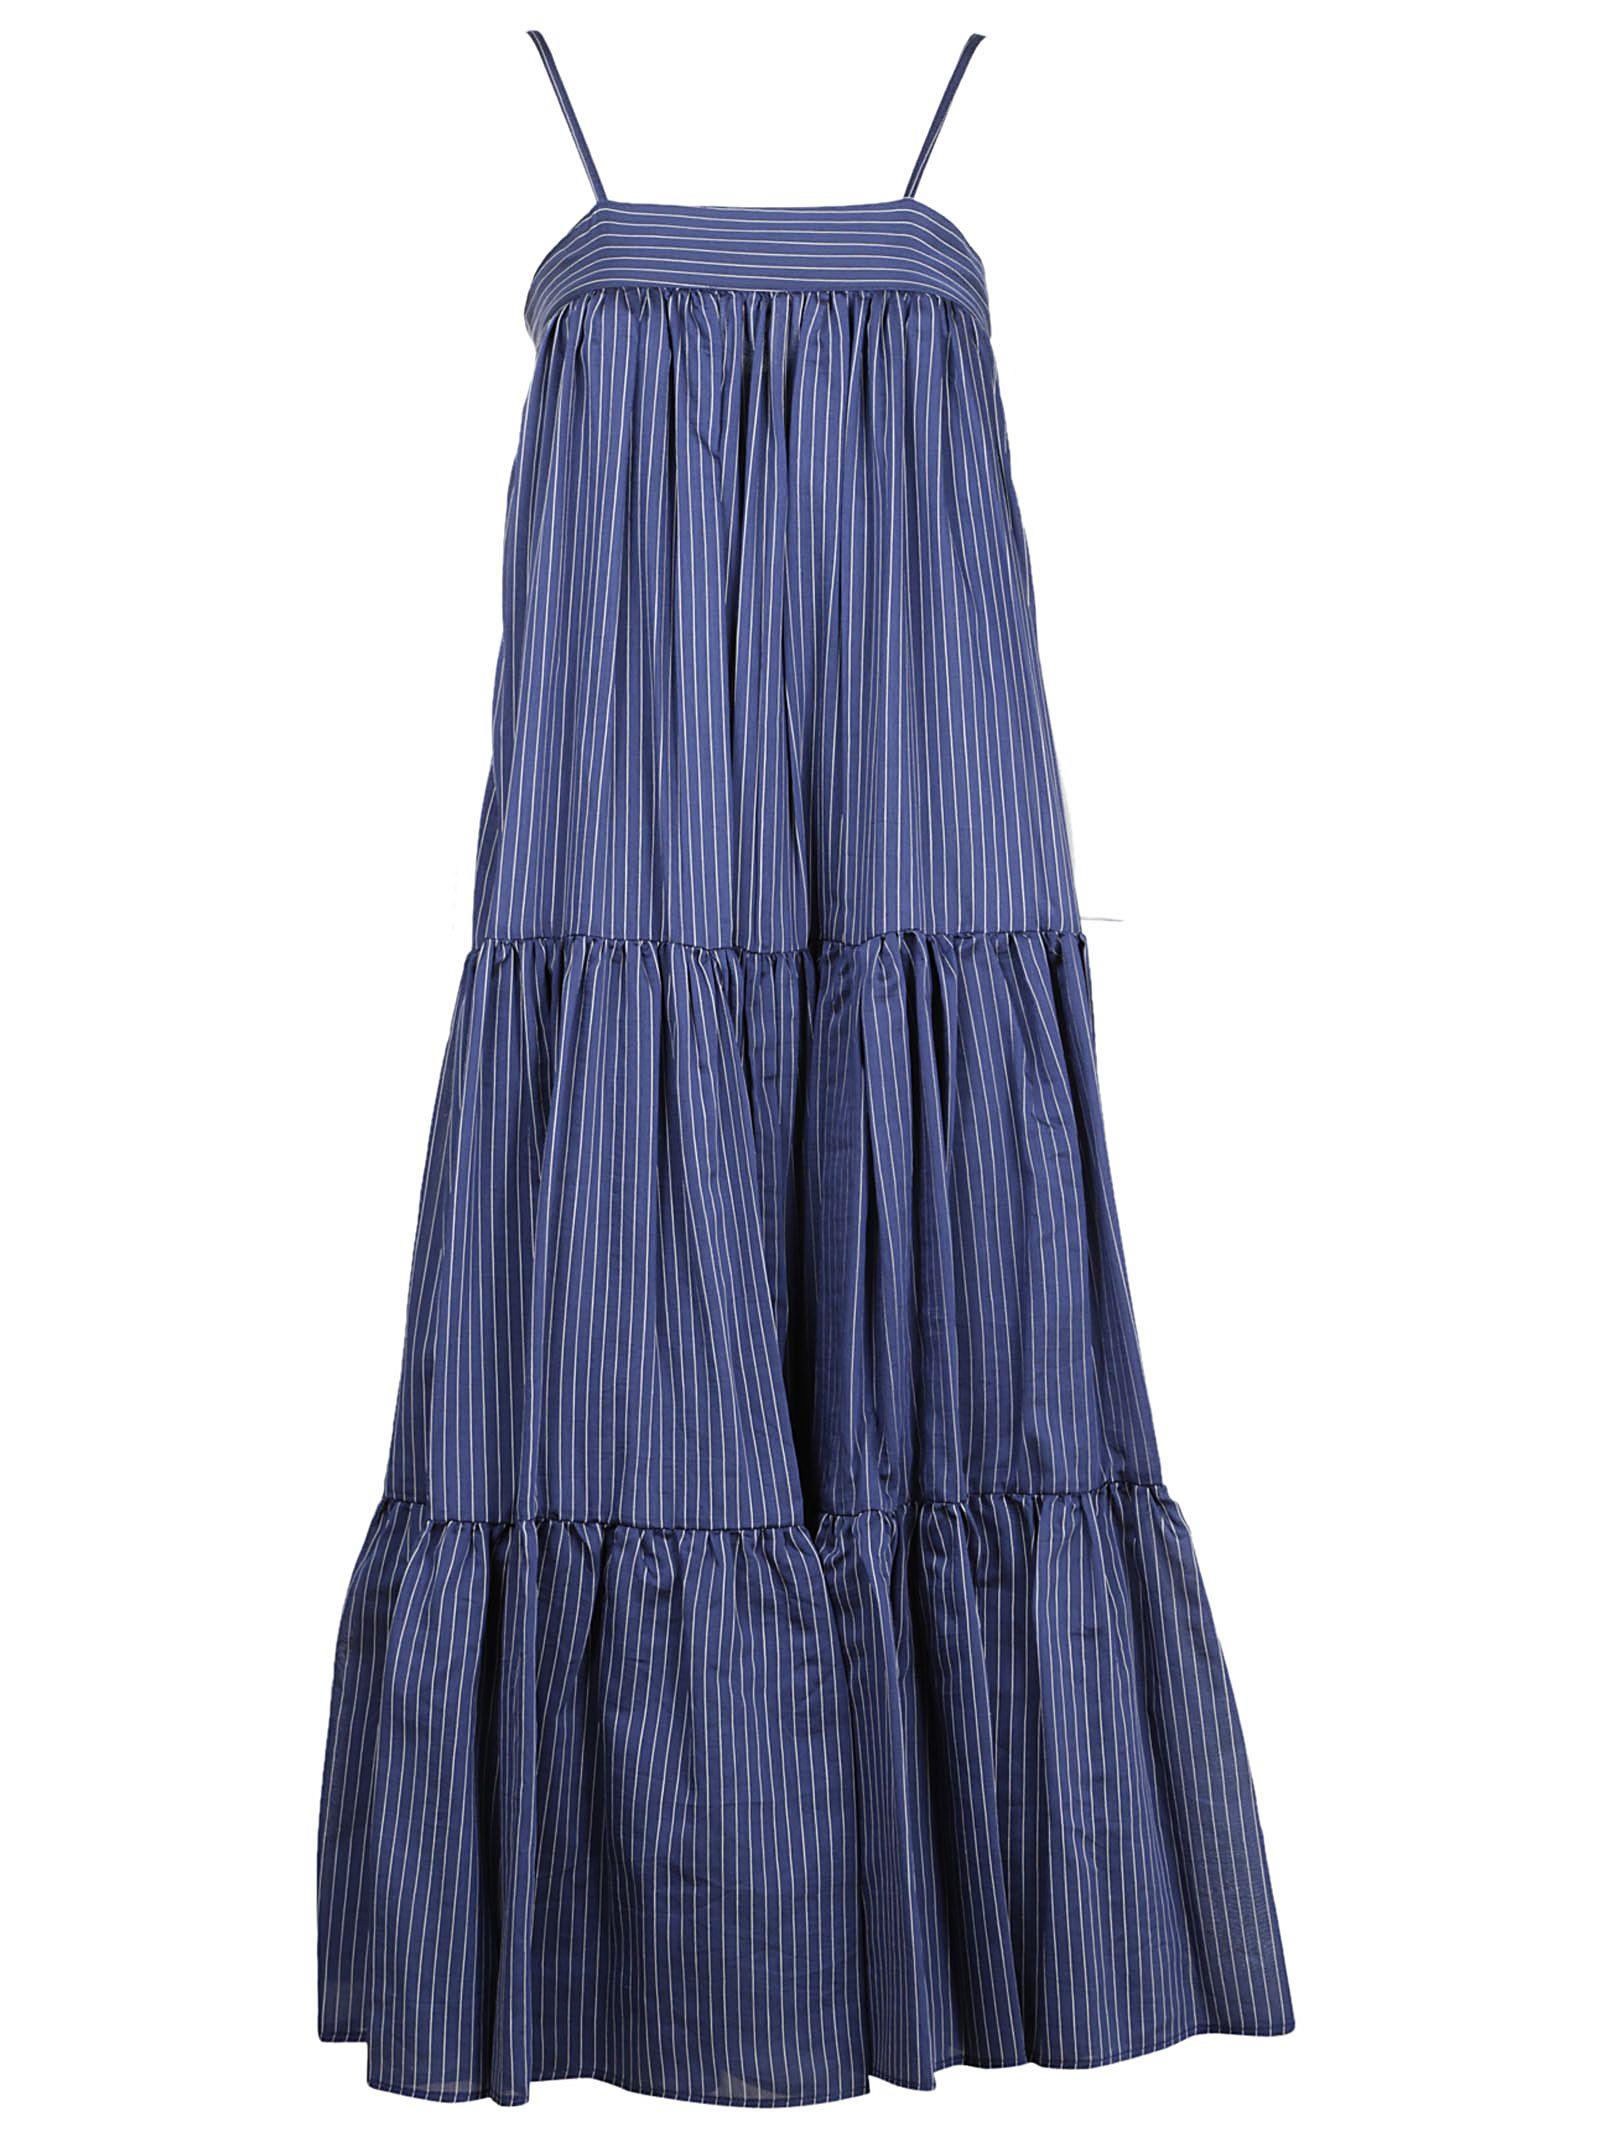 Erika Cavallini Pinstripe Dress